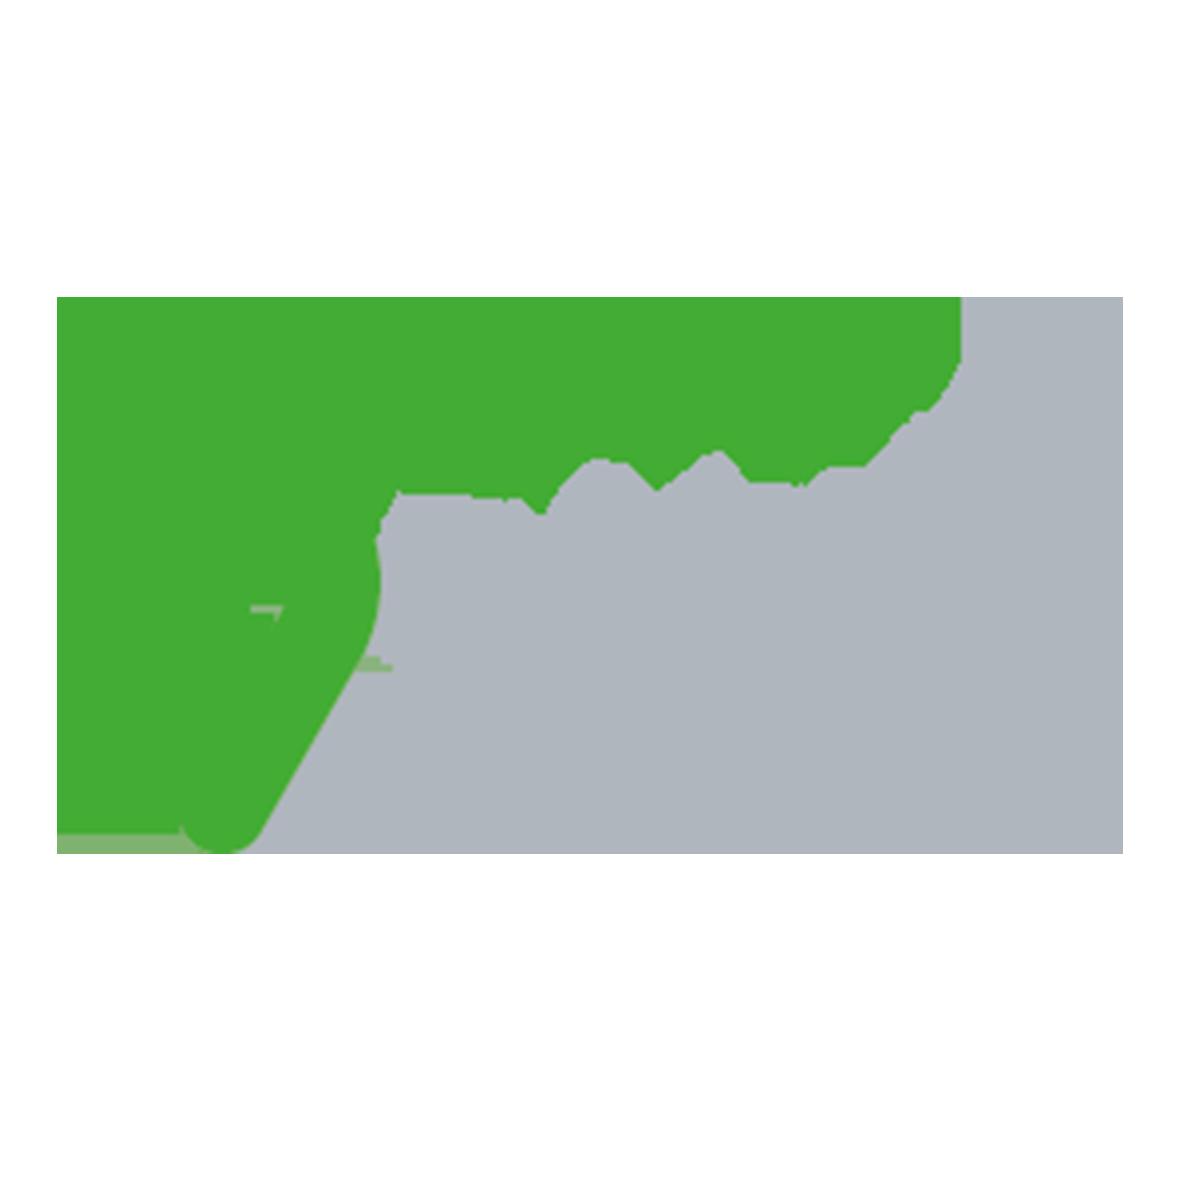 Base Vevey Logo - HoCoSo Track Record